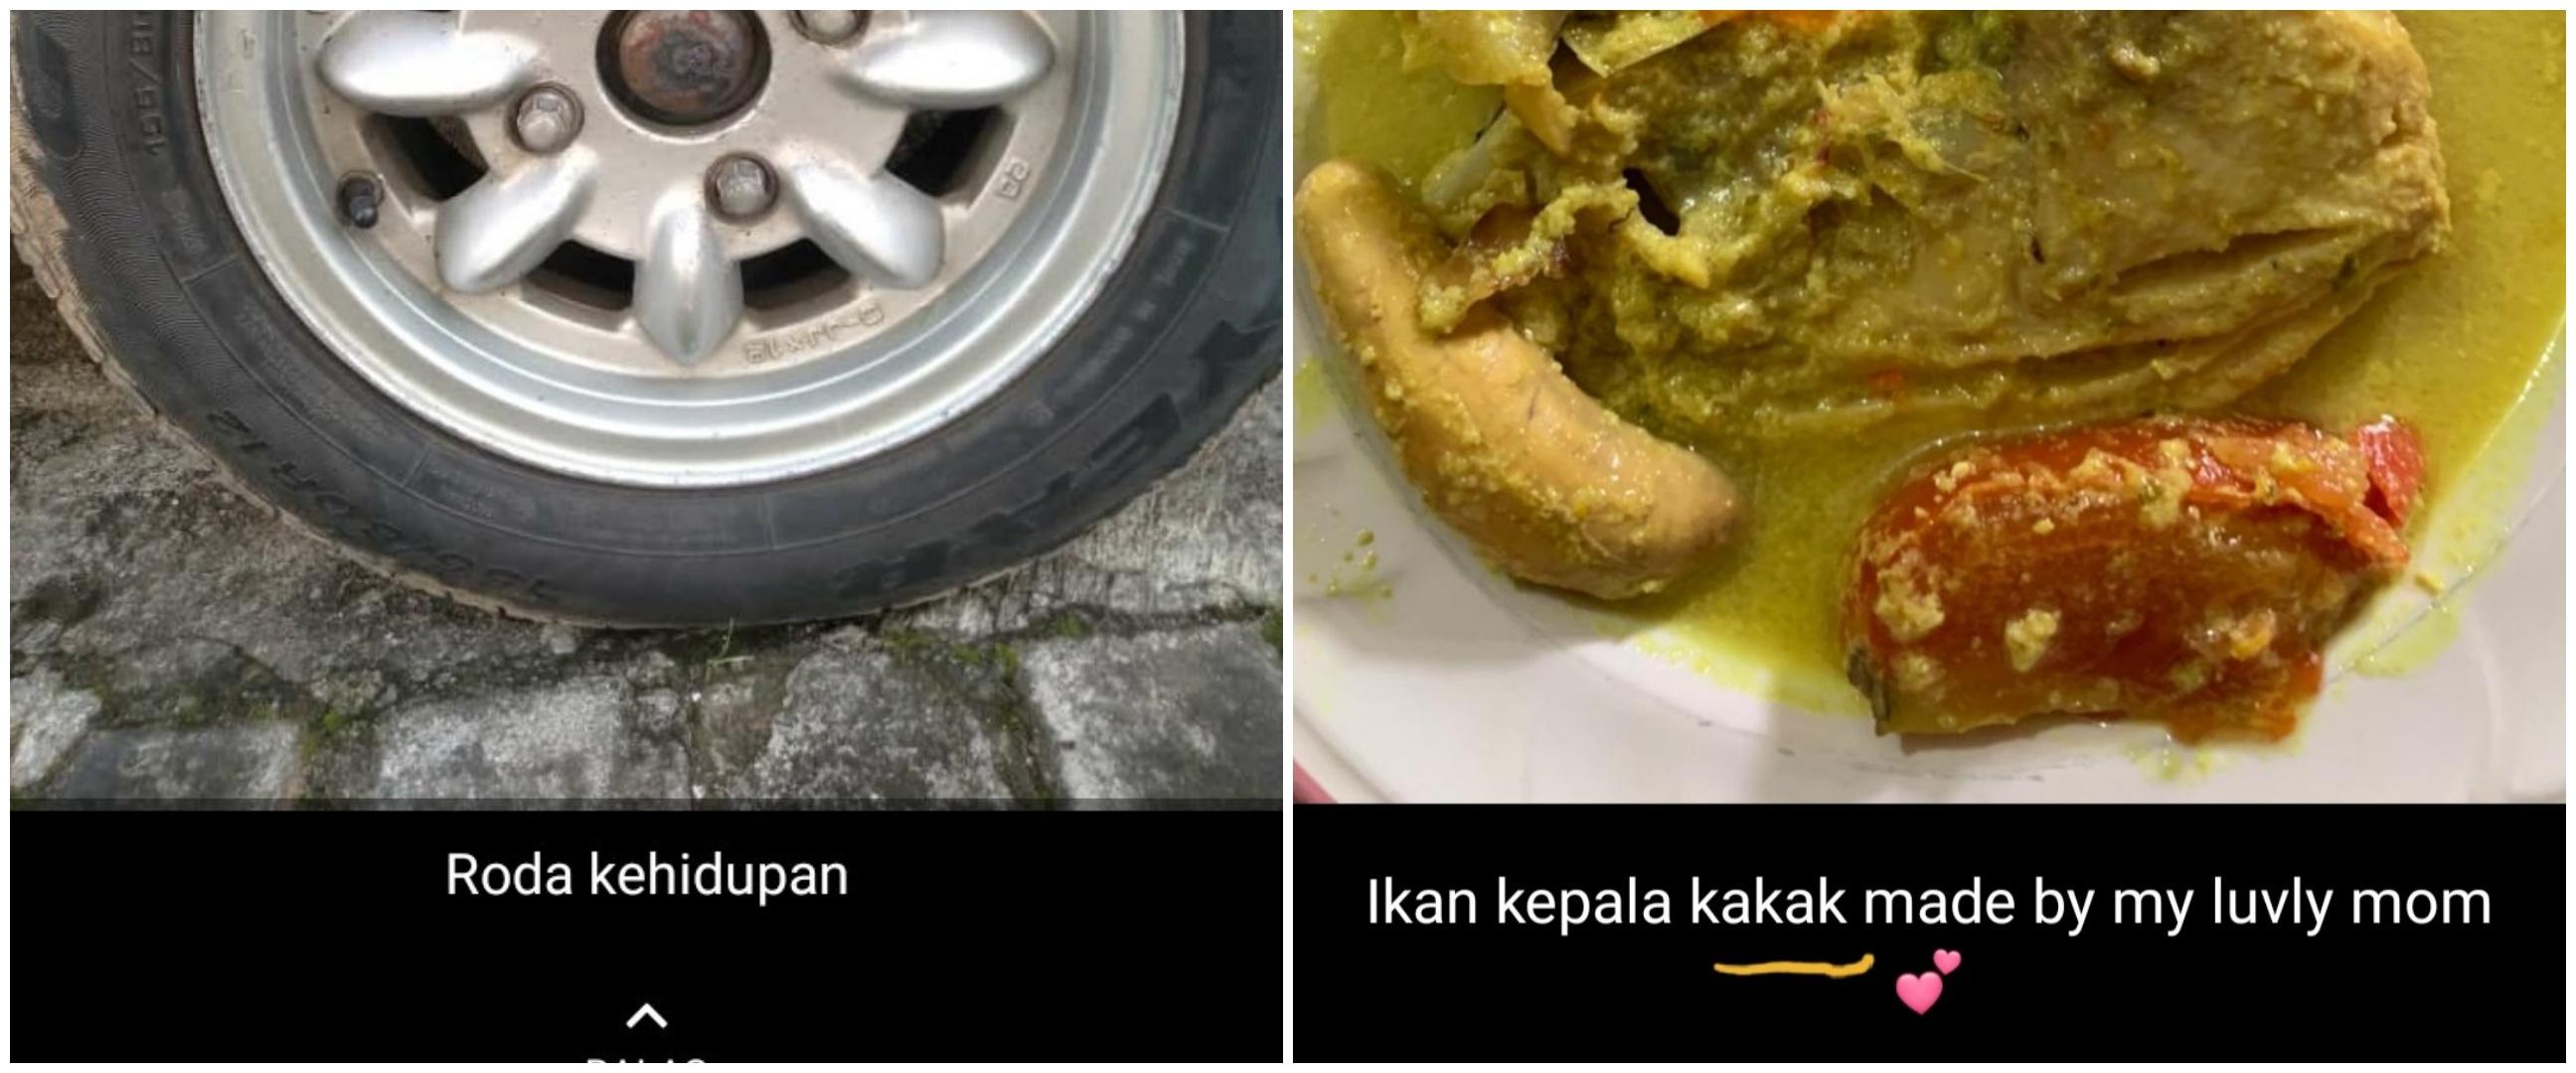 11 Status lucu di WhatsApp ini captionnya bikin mikir keras